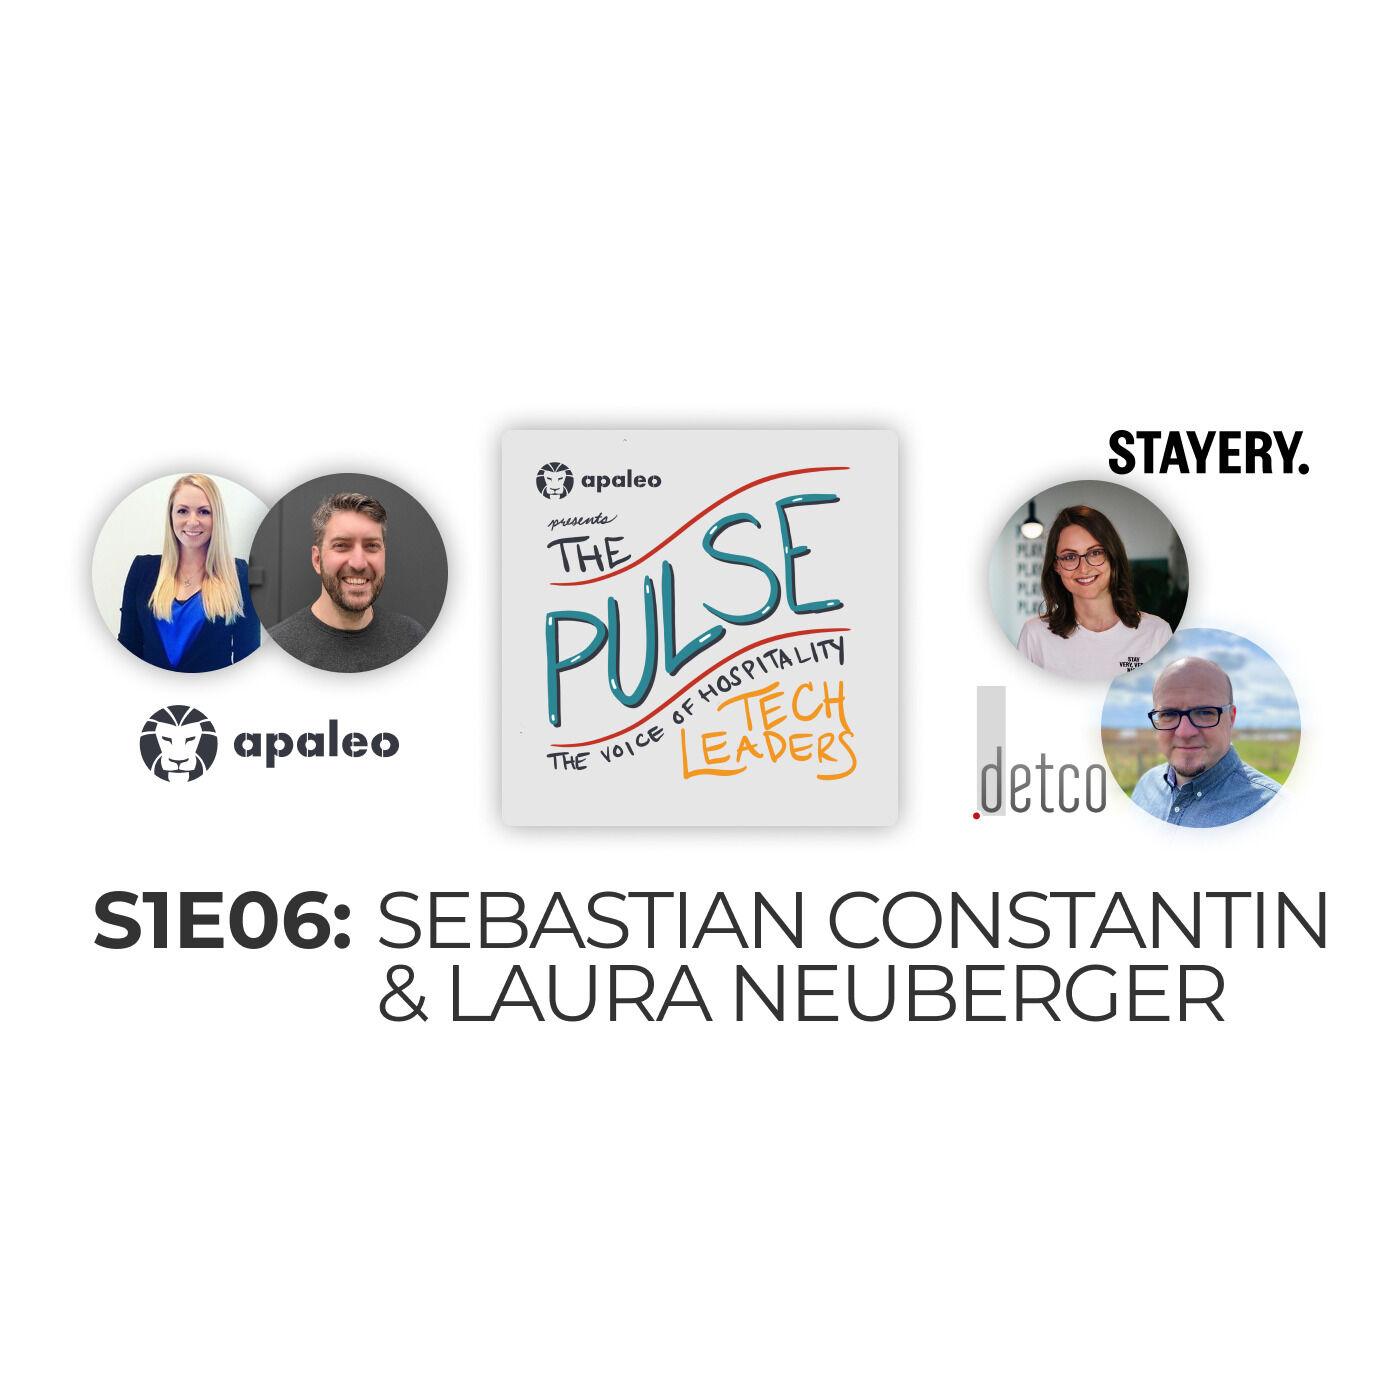 """Customization & Simplicity"" Stayery's Laura Neuberger & detco's Sebastian Constantin"